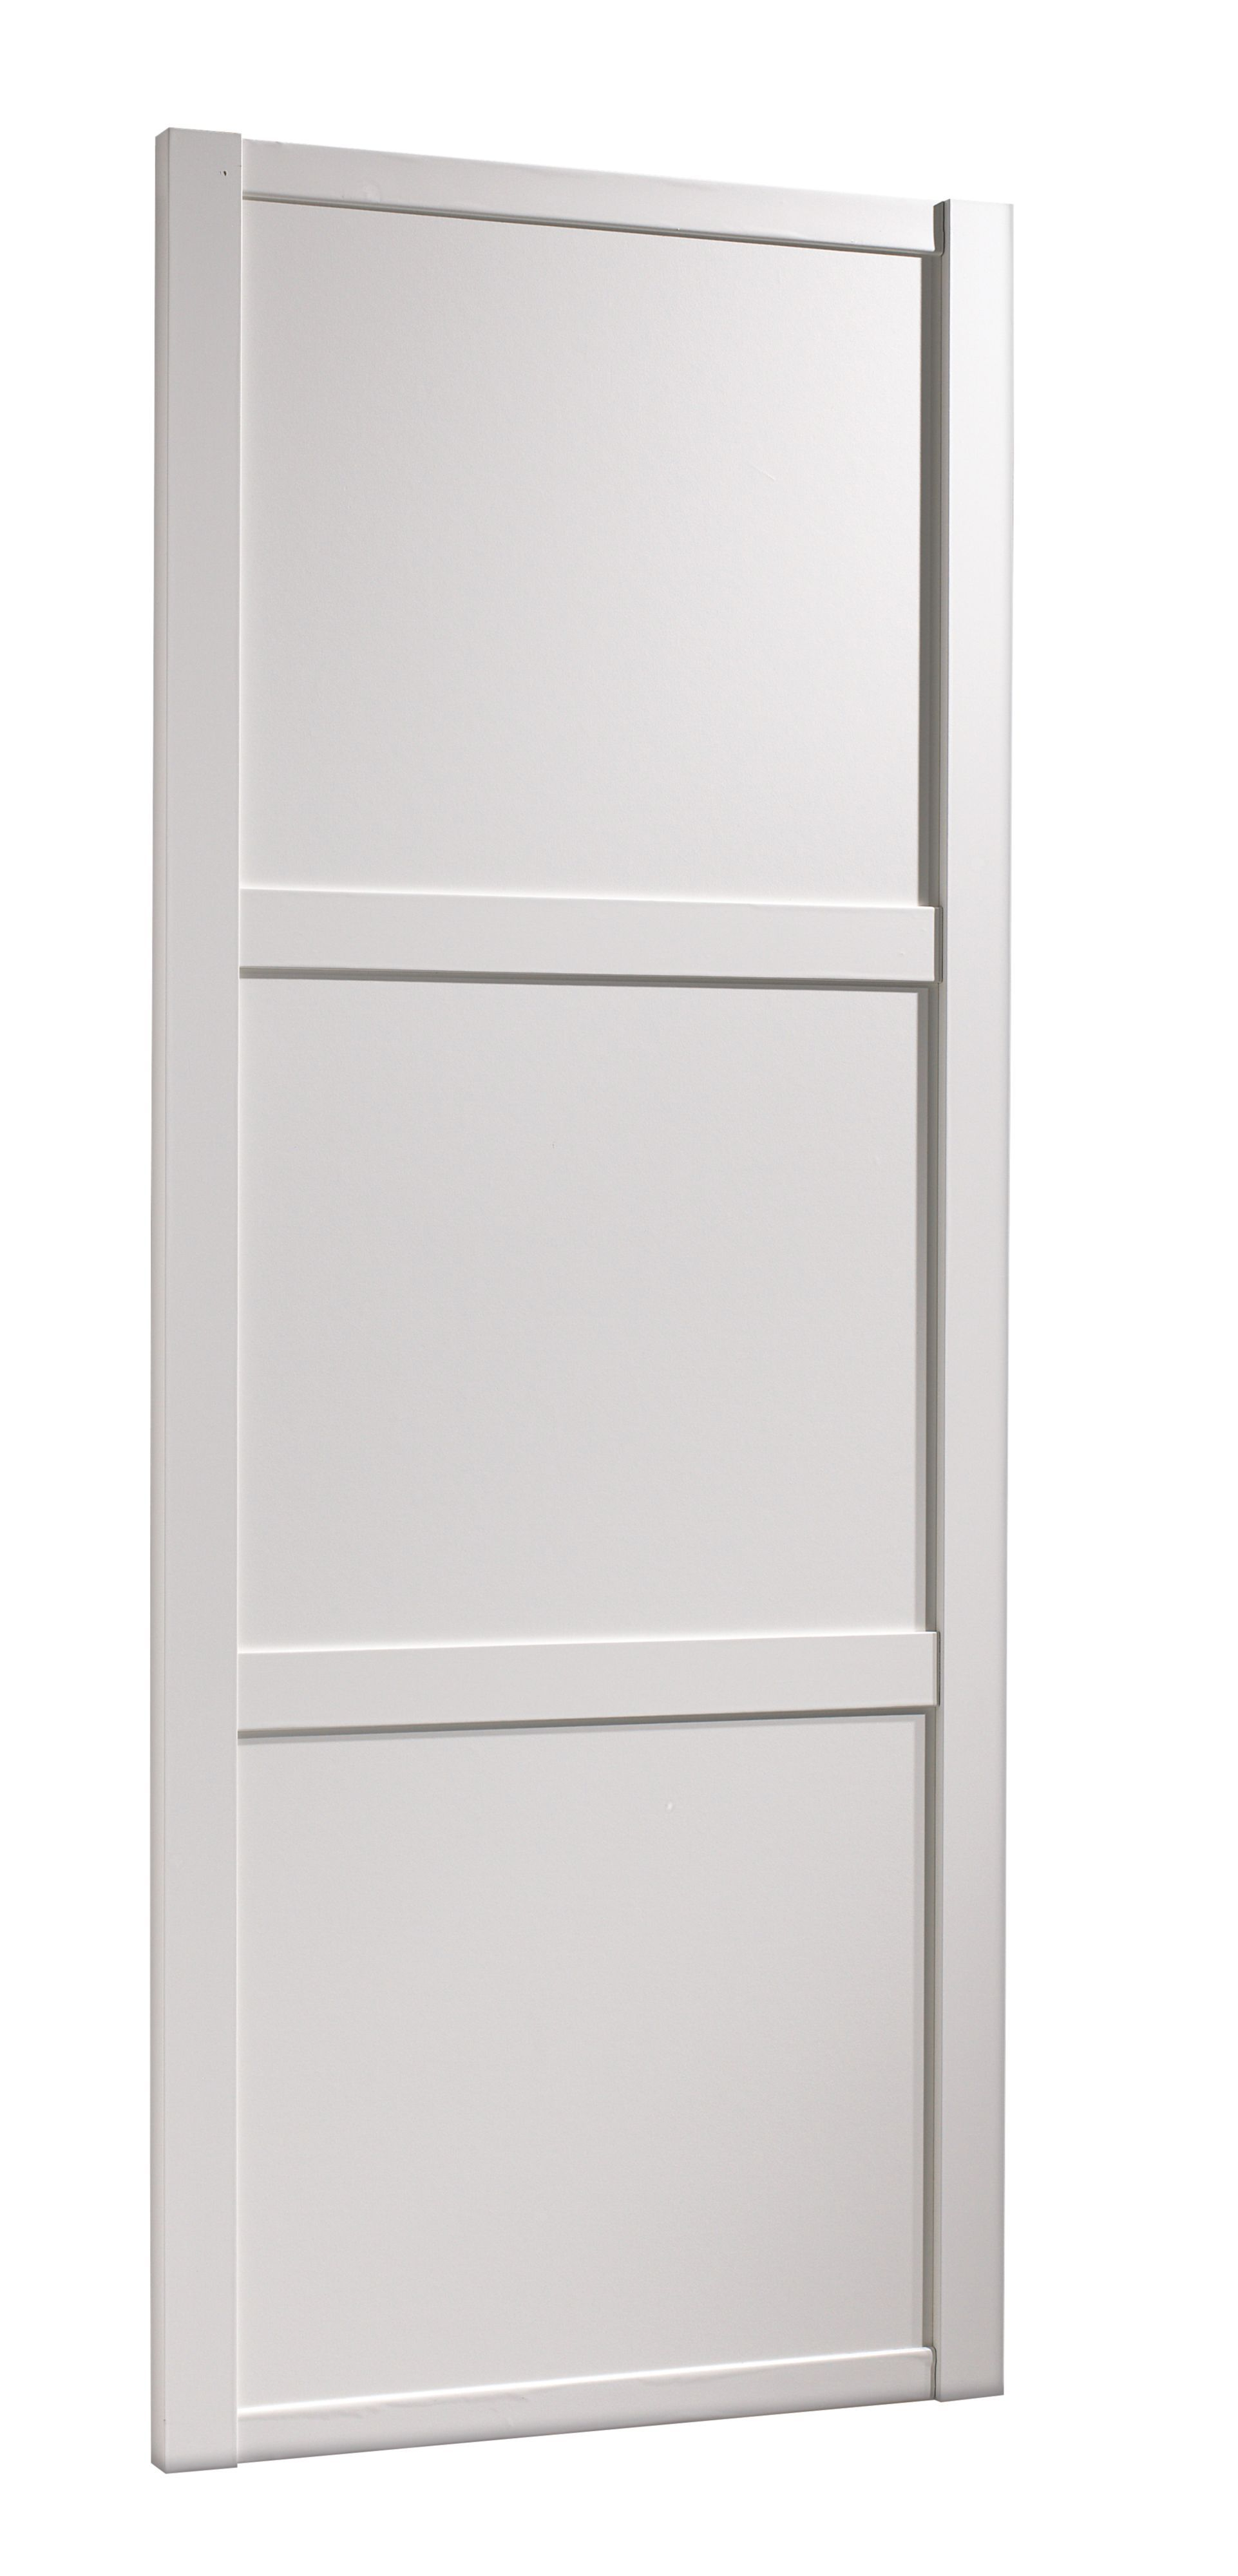 Traditional White Panel Effect Sliding Wardrobe Door H